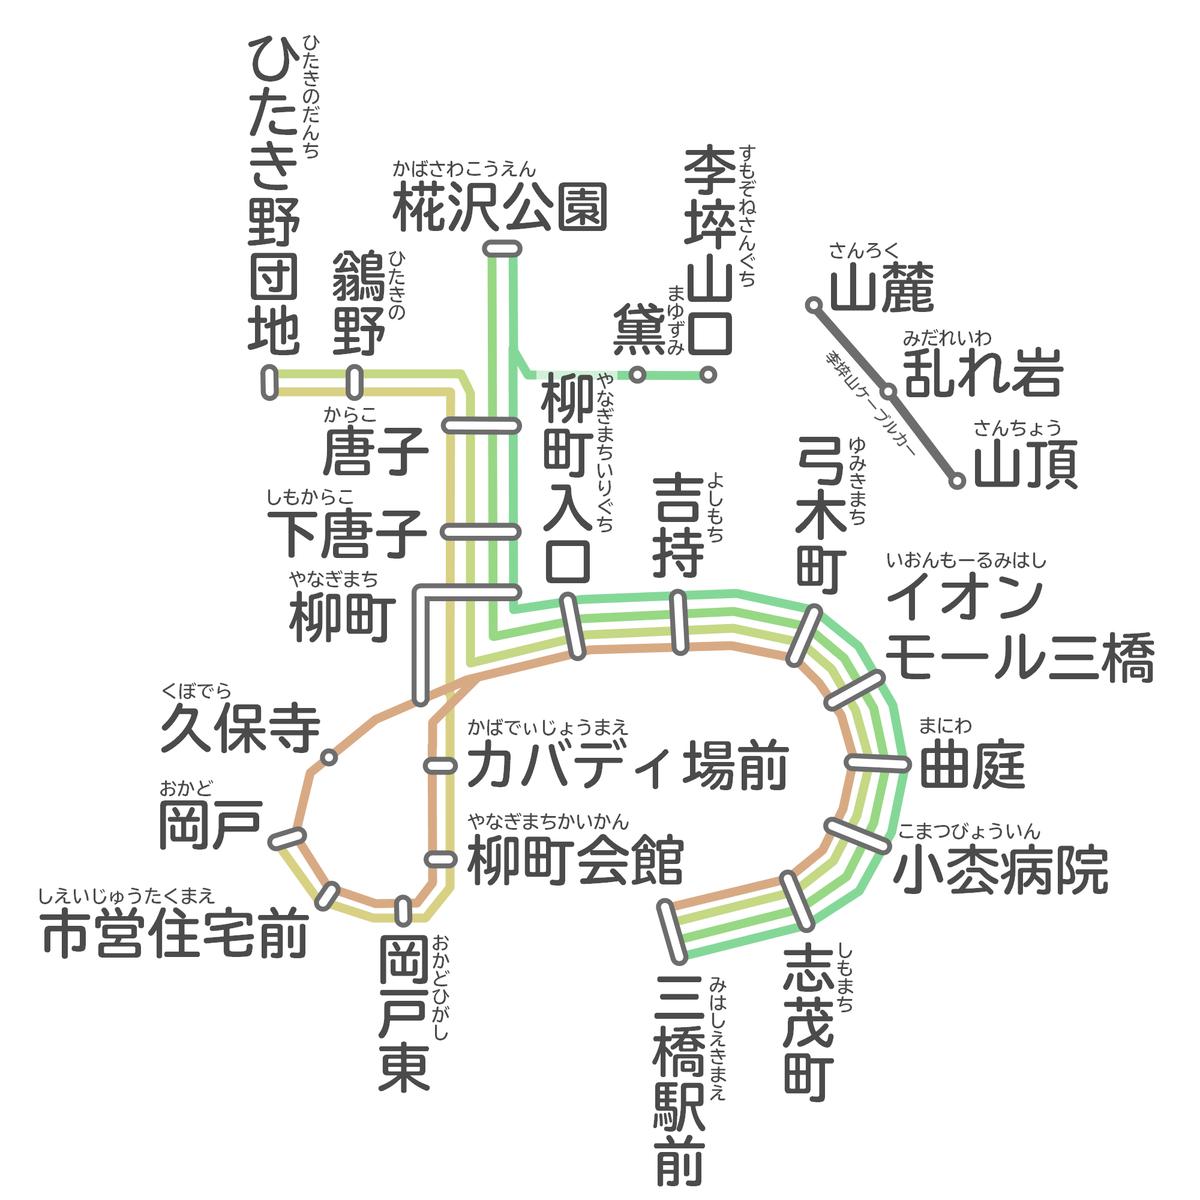 f:id:HOSHIIMO:20210723032438p:plain